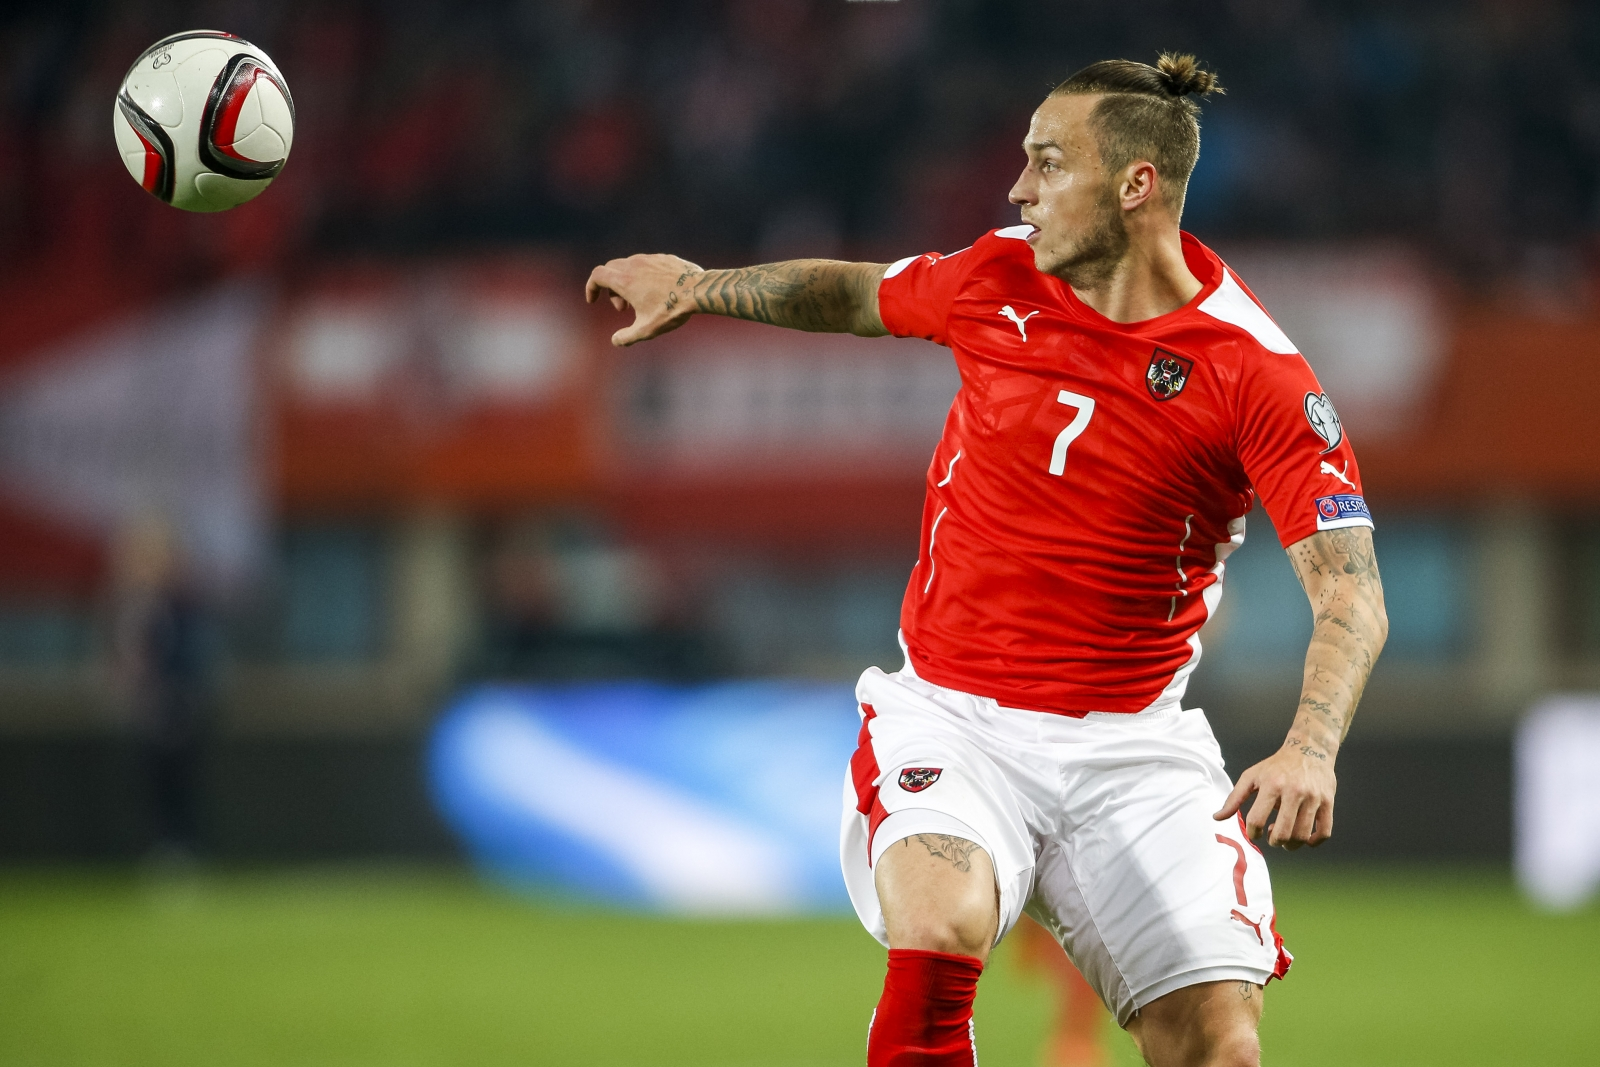 Euro 2016 player to watch: Marko Arnautovic - Revitalised ...